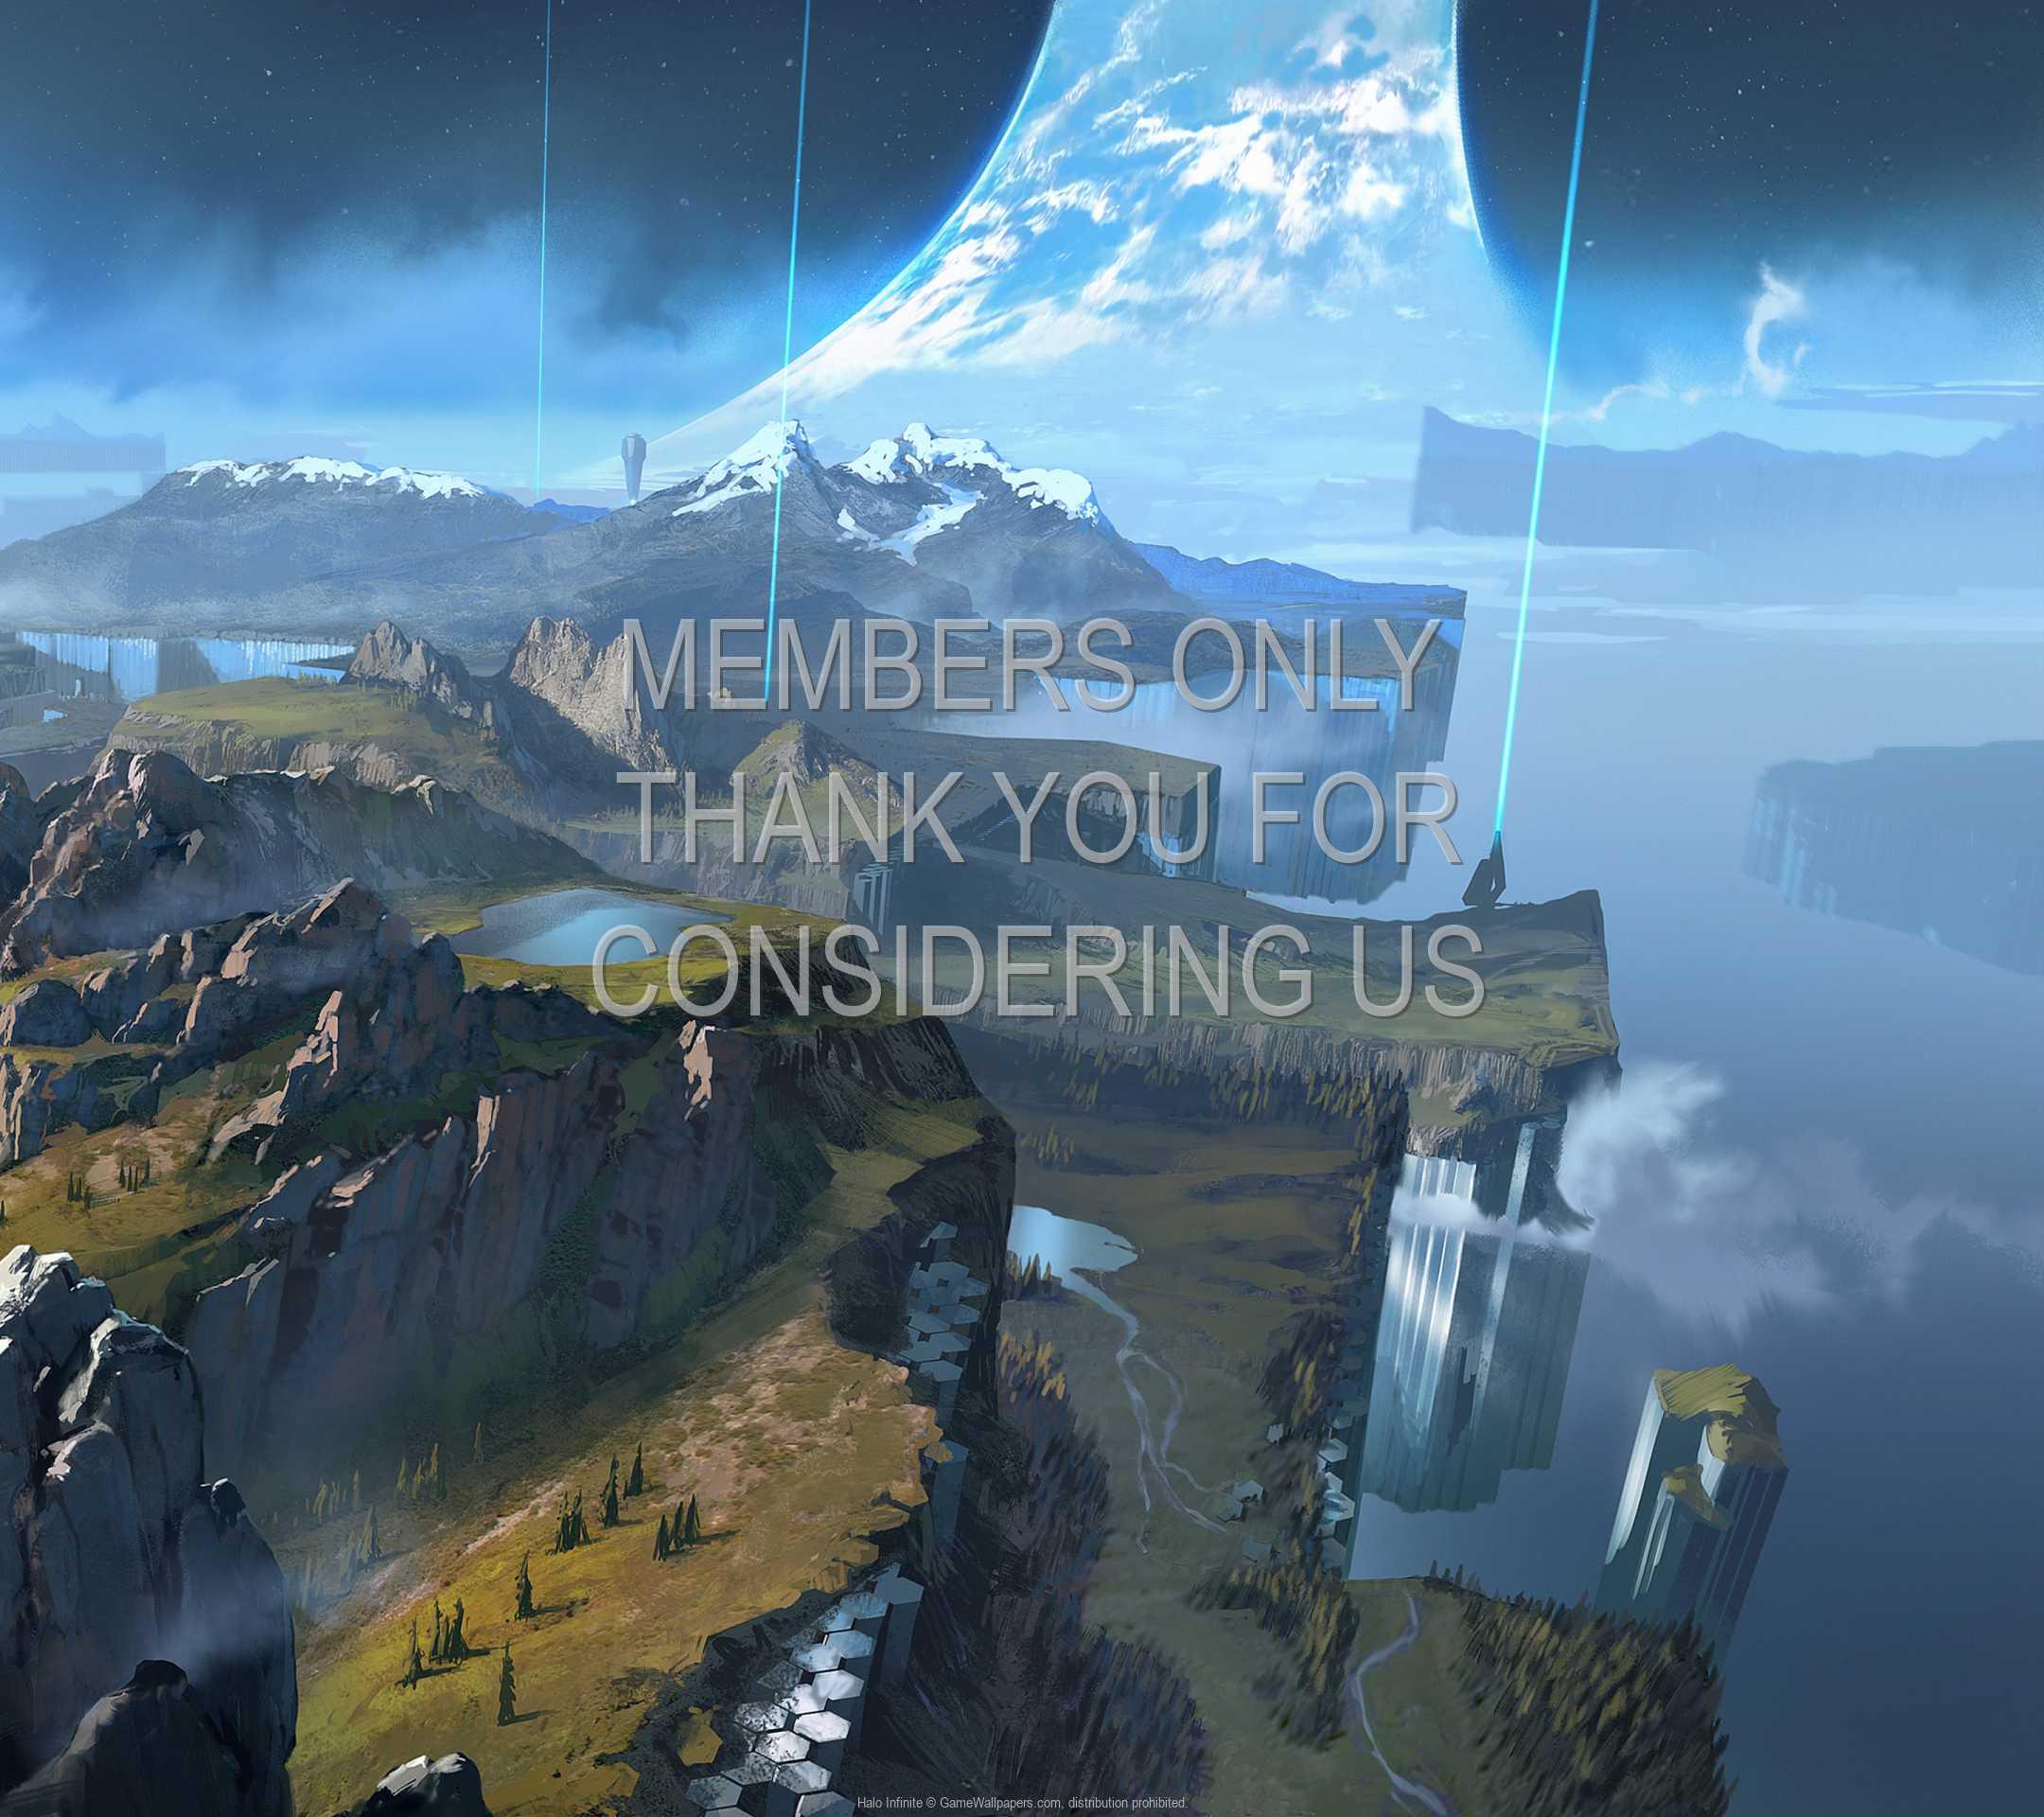 Halo: Infinite 1080p Horizontal Mobile wallpaper or background 06